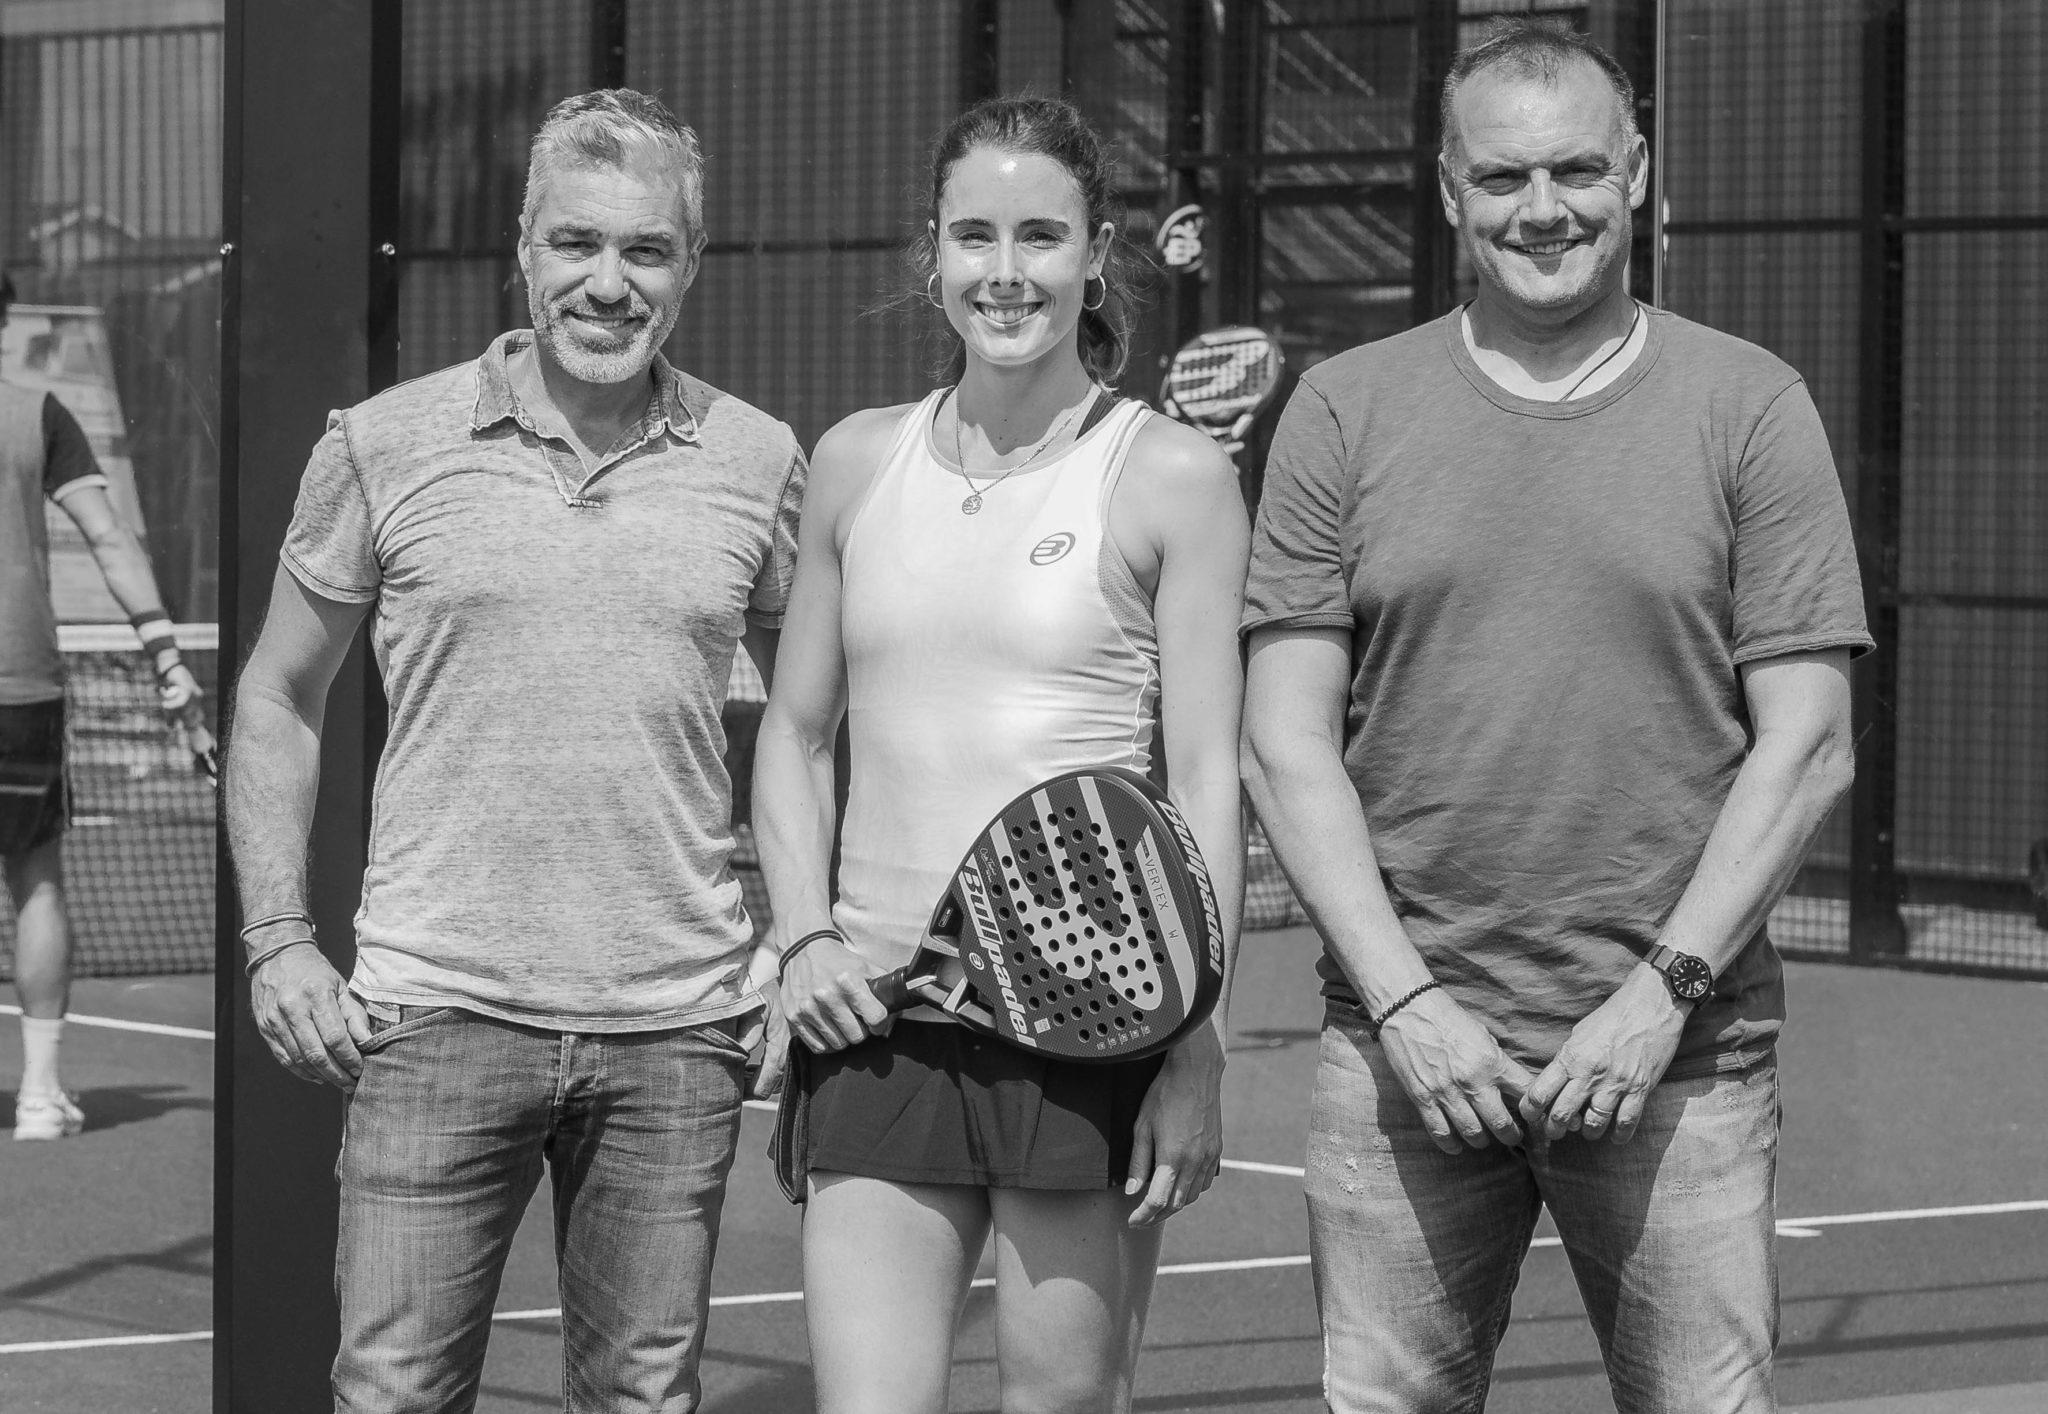 Alizé Cornet s'incorpora a l'equip BULLPADEL